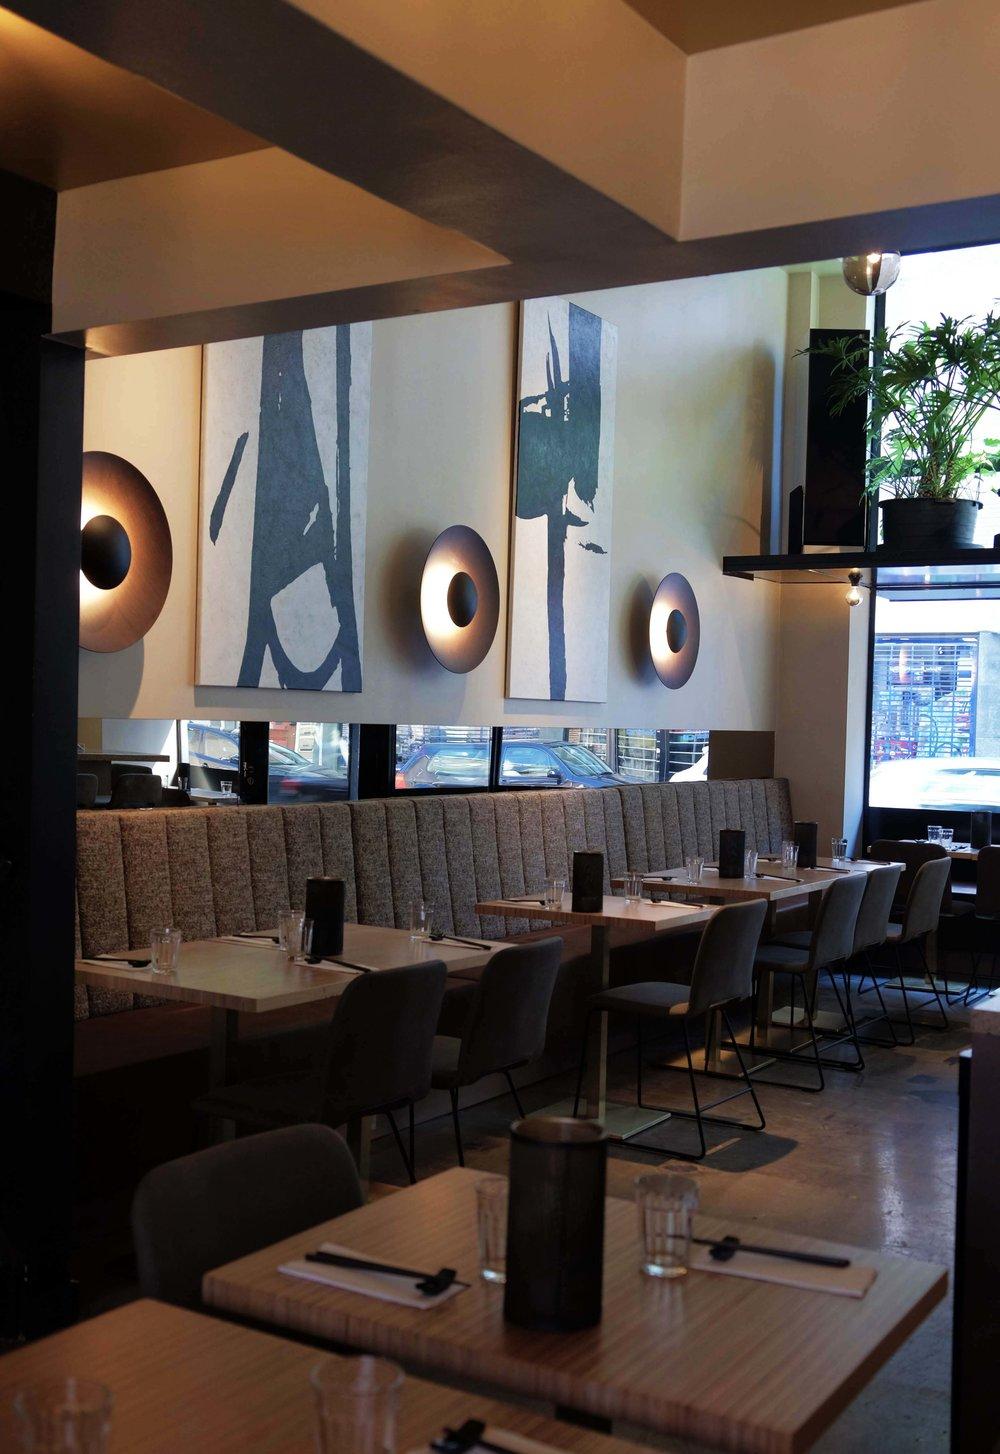 Restaurant Nooch Rotterdam westewagenstraat 56 lex de gooijer interiors 006.jpg